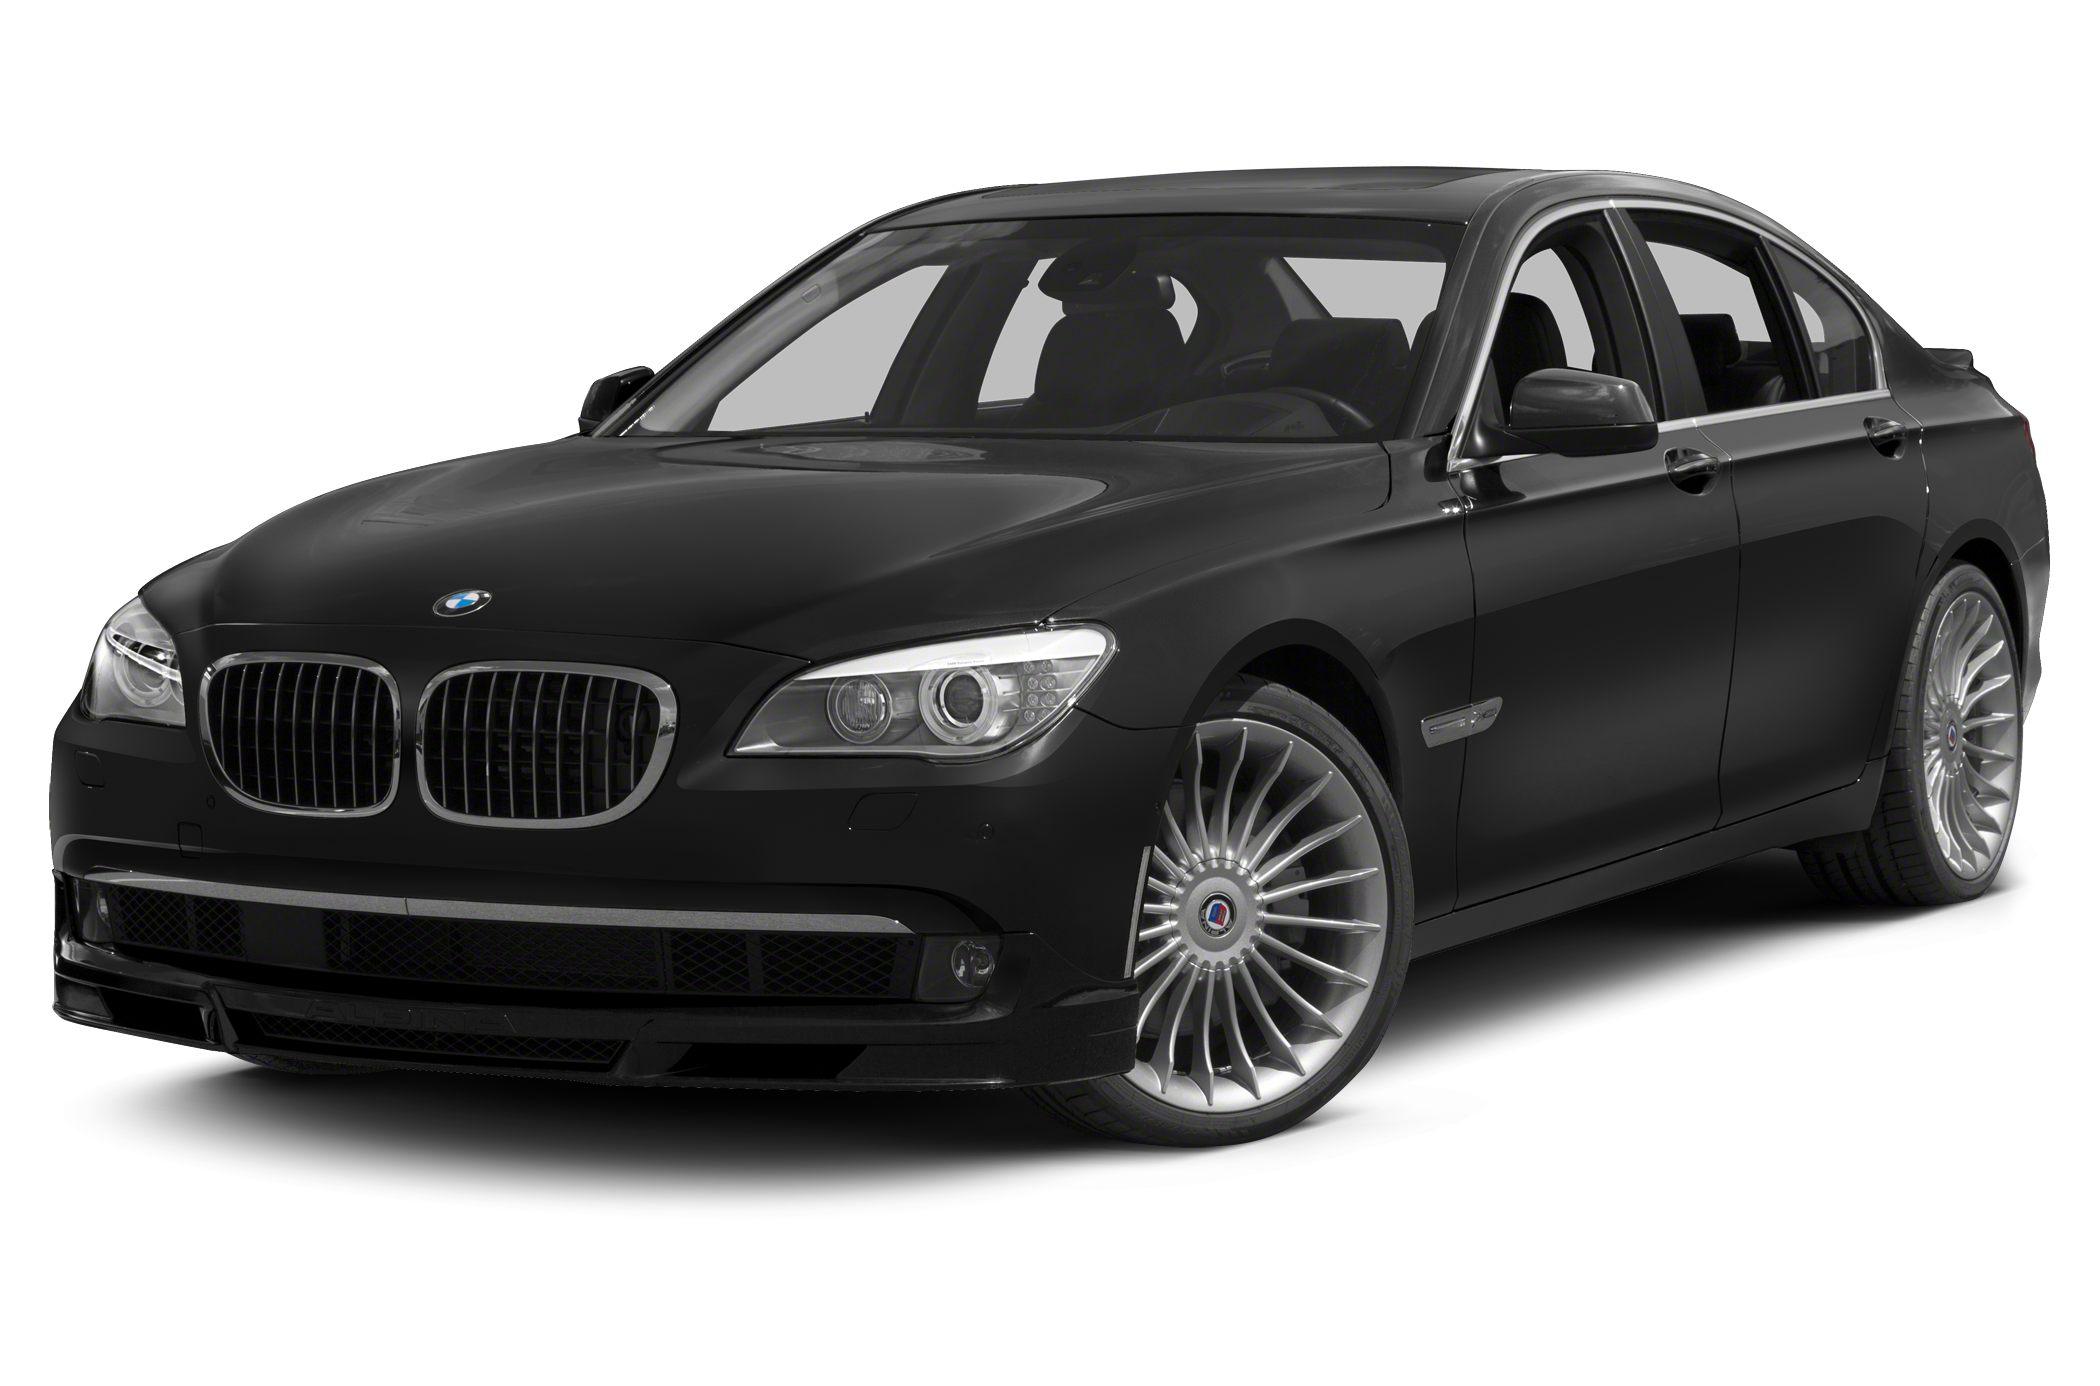 2012 Bmw Alpina B7 Specs And Prices